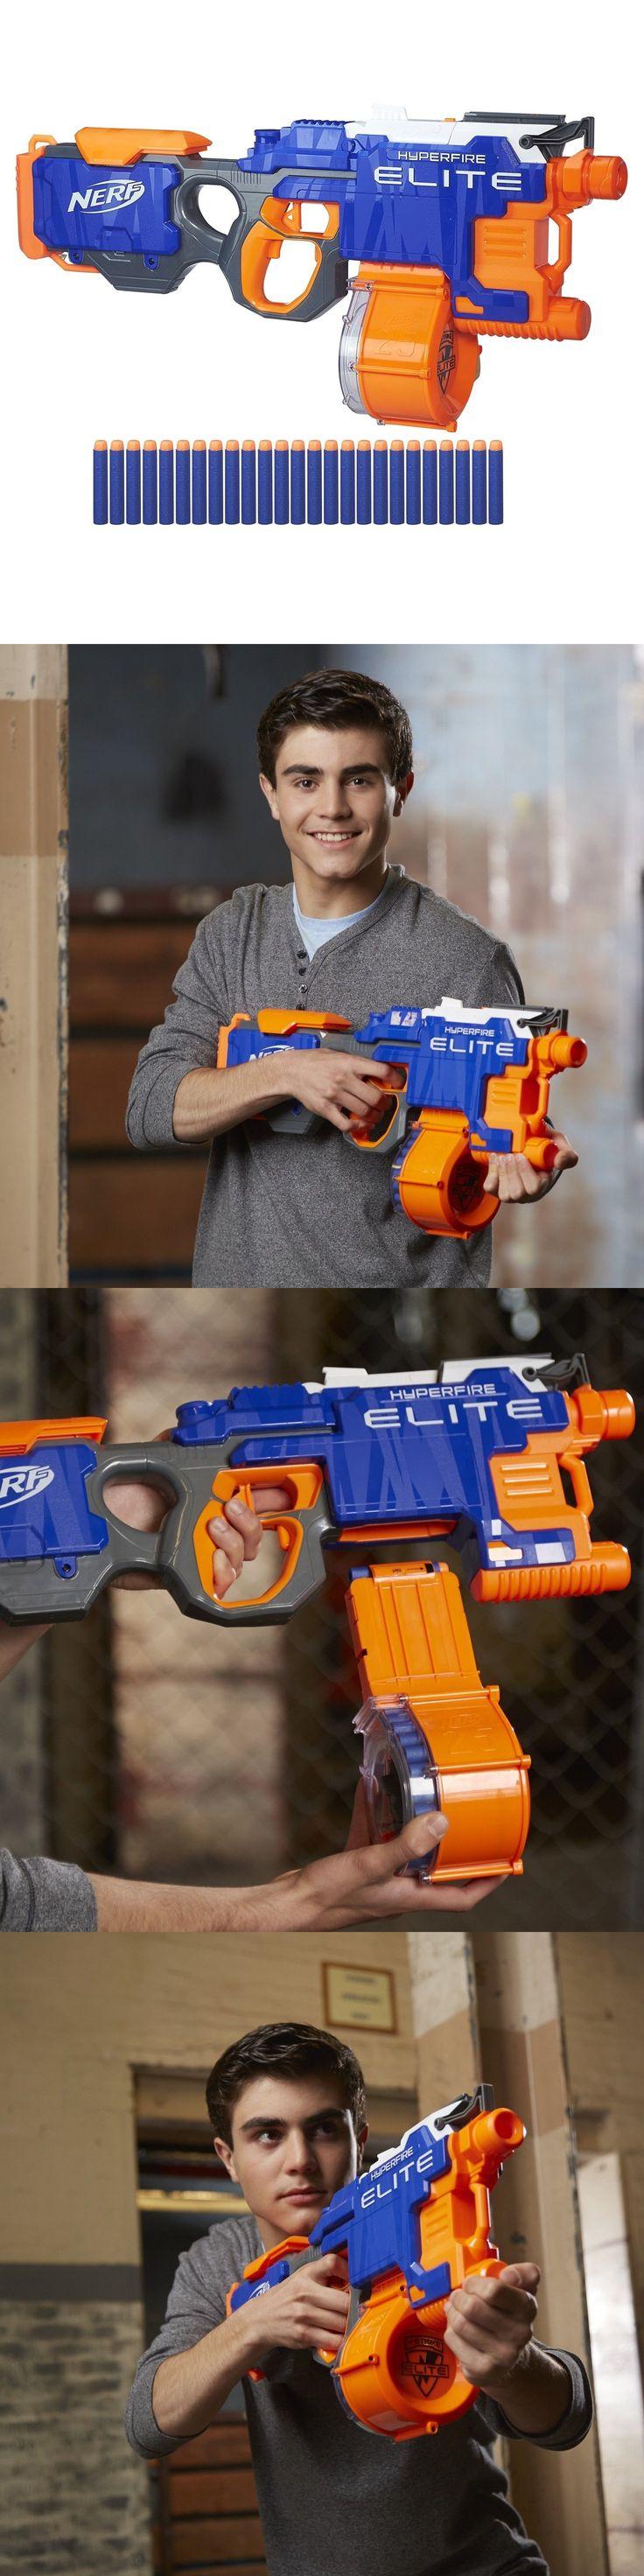 Dart Guns and Soft Darts 158749: Top Quality Original Nerf N-Strike Elite Hyperfire Blaster -> BUY IT NOW ONLY: $37.63 on eBay!